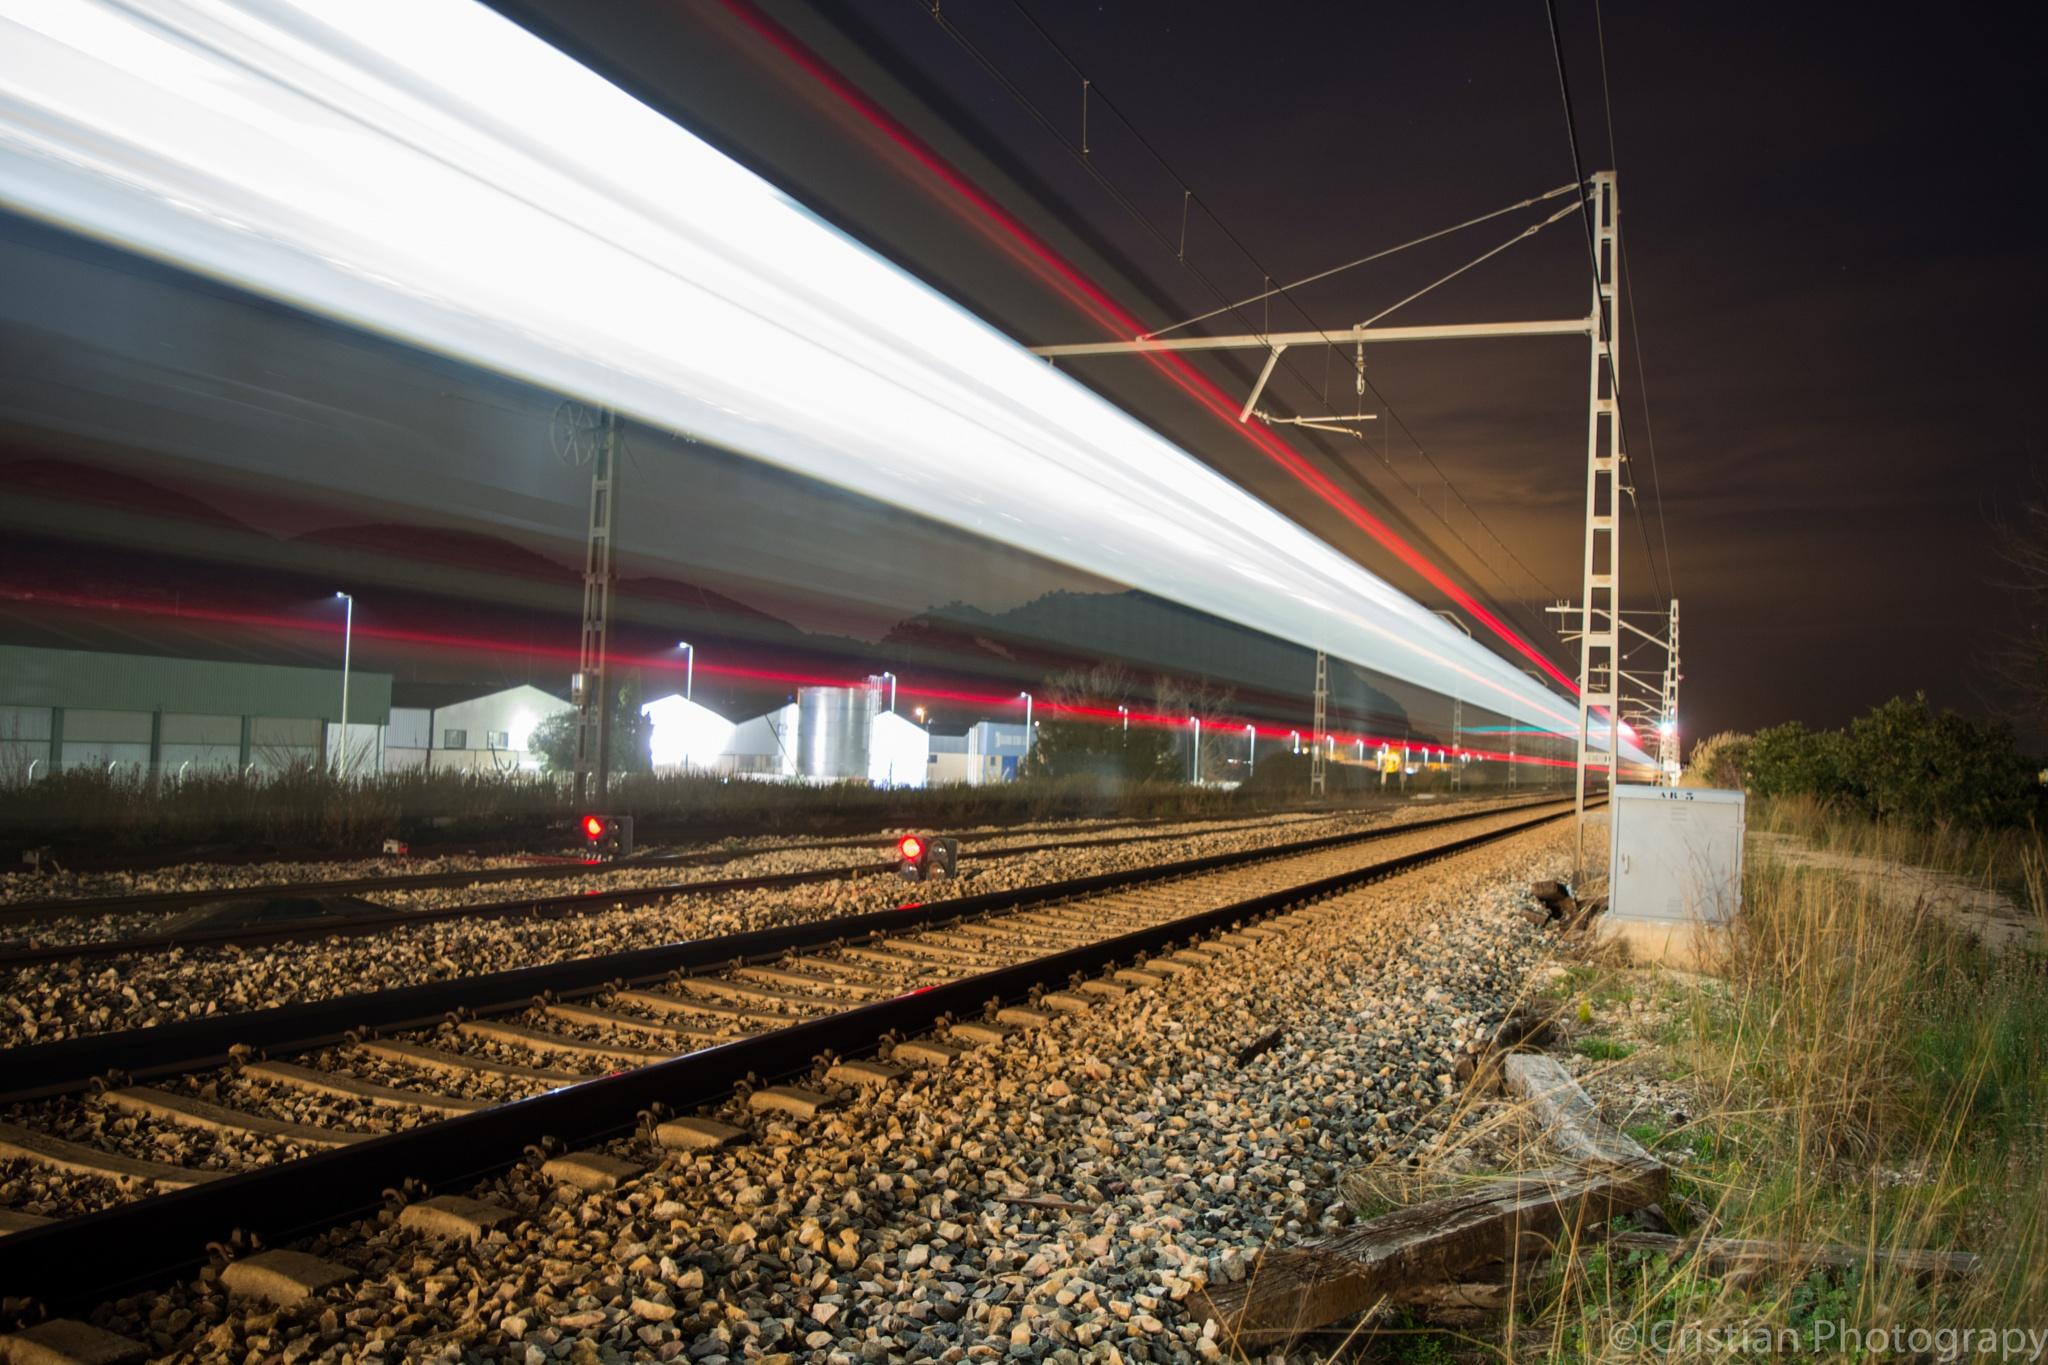 Tren de alta velocidad by cristianphotography